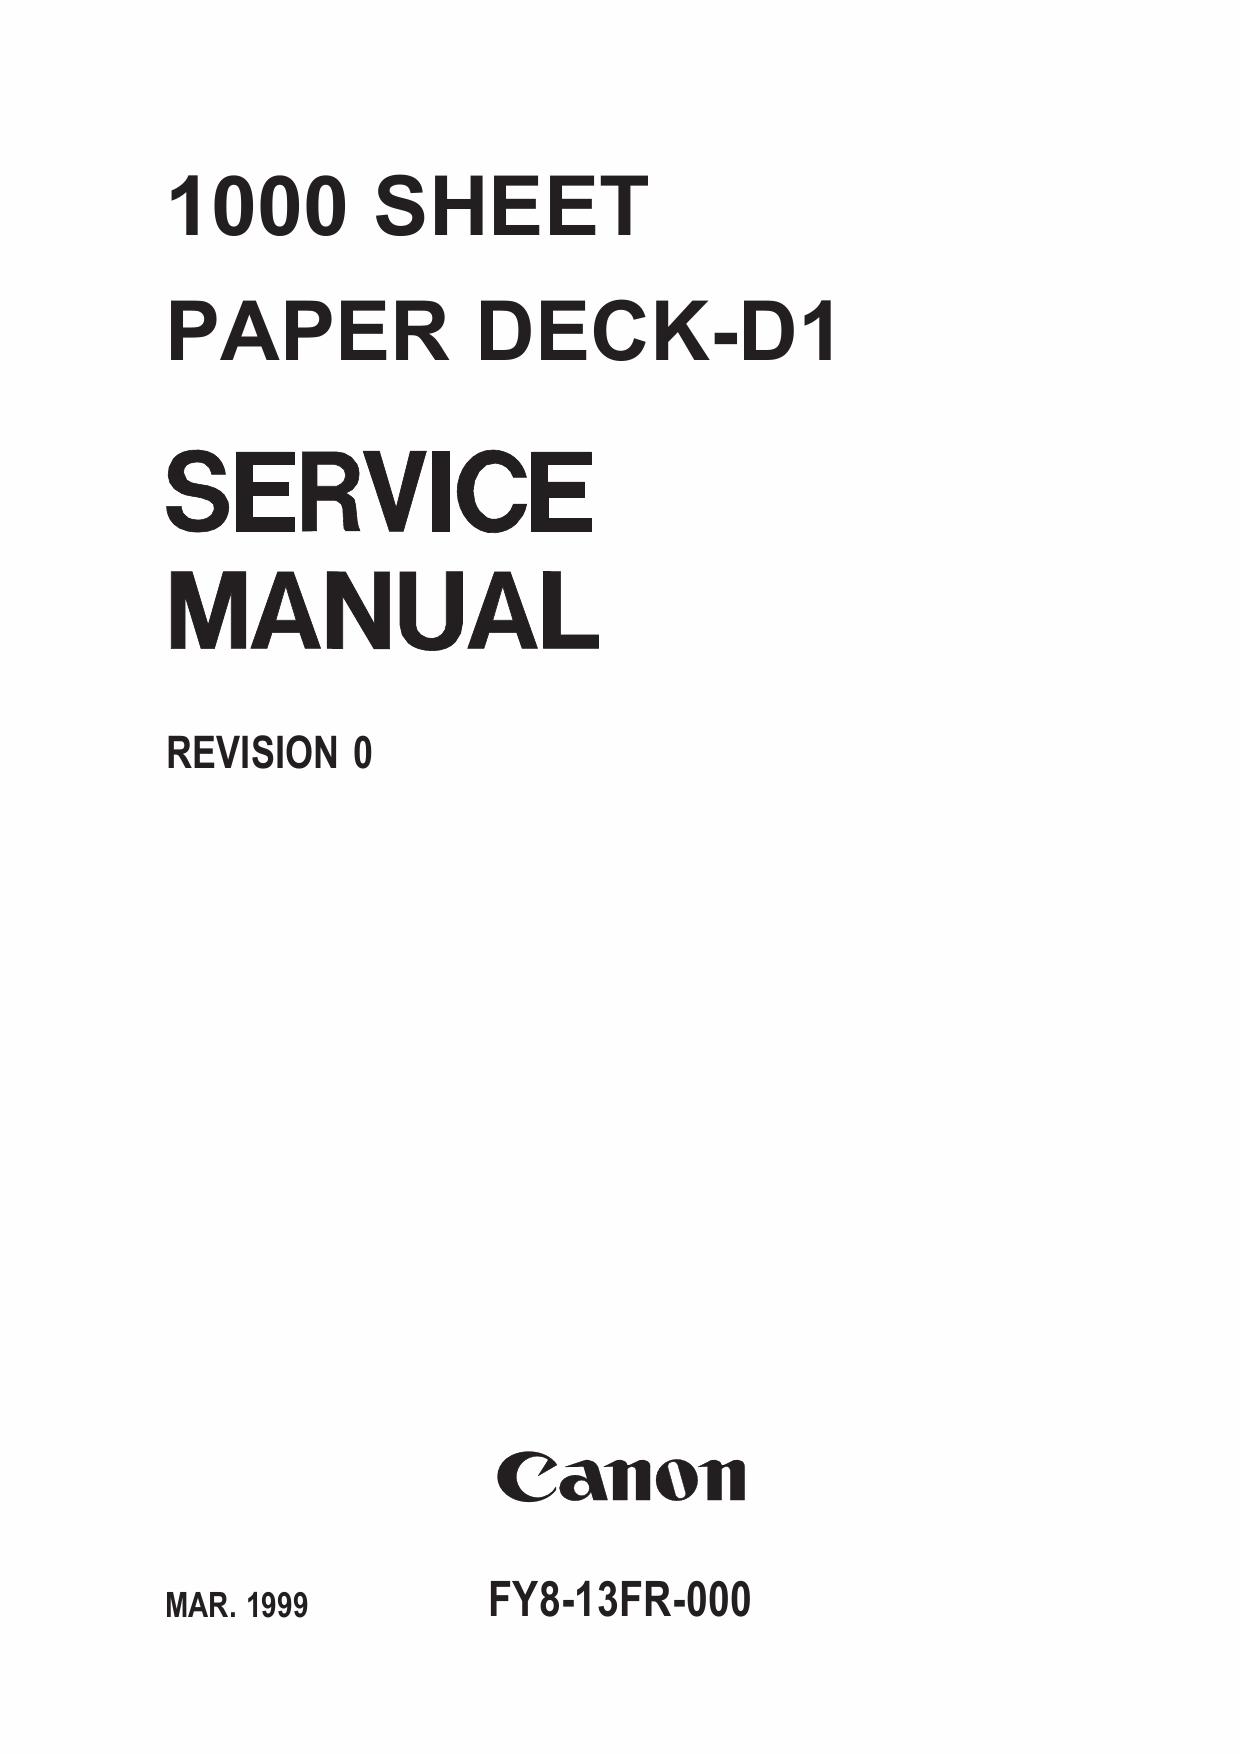 canon options sheet1000 paper deck d1 parts and service manual. Black Bedroom Furniture Sets. Home Design Ideas